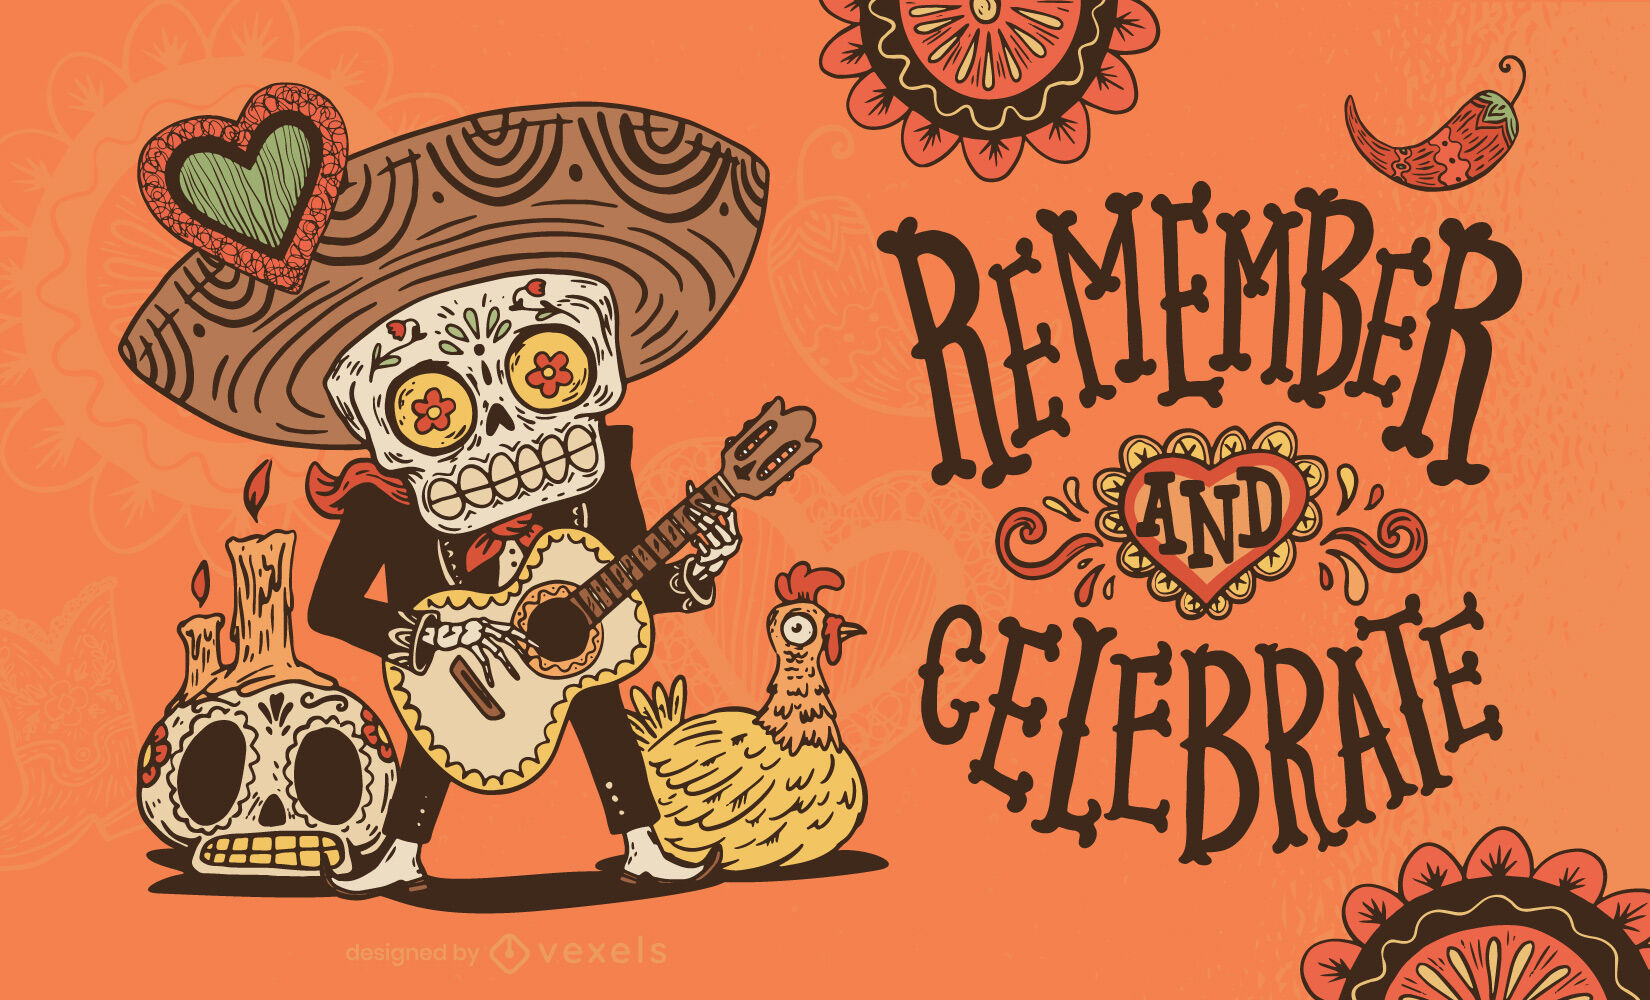 Skeleton musician day of the dead illustration